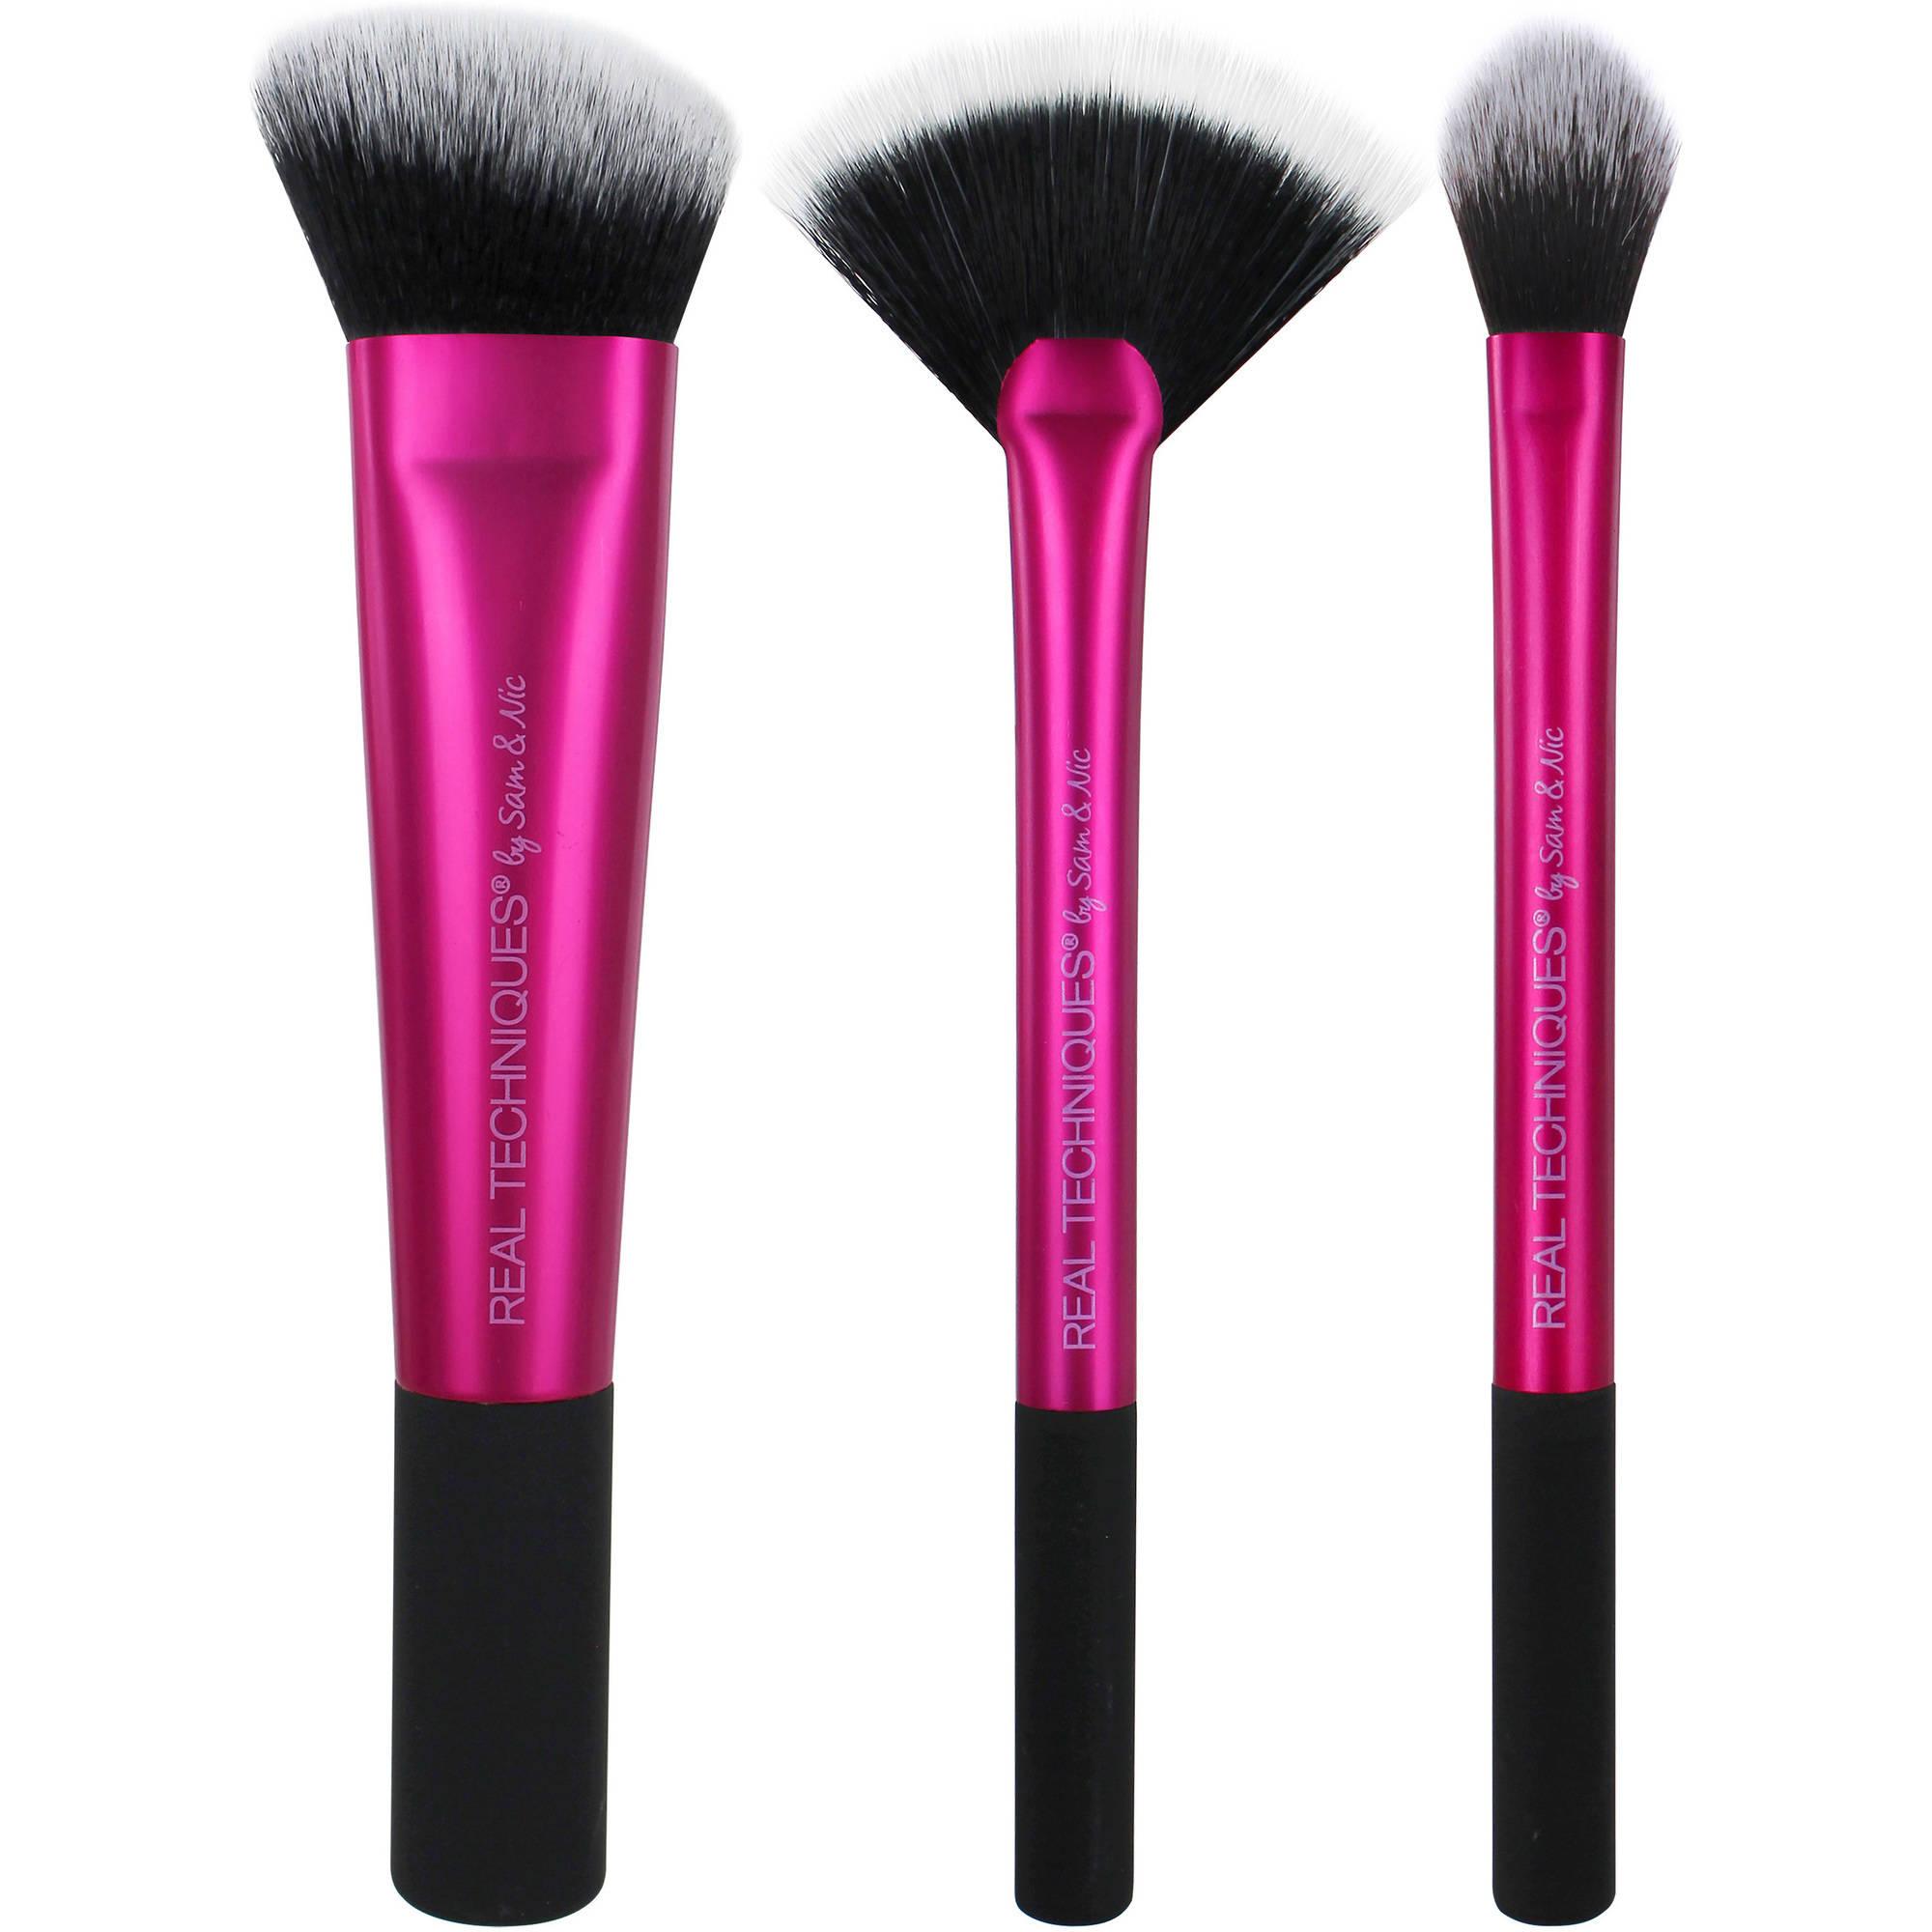 Makeup brush set real techniques